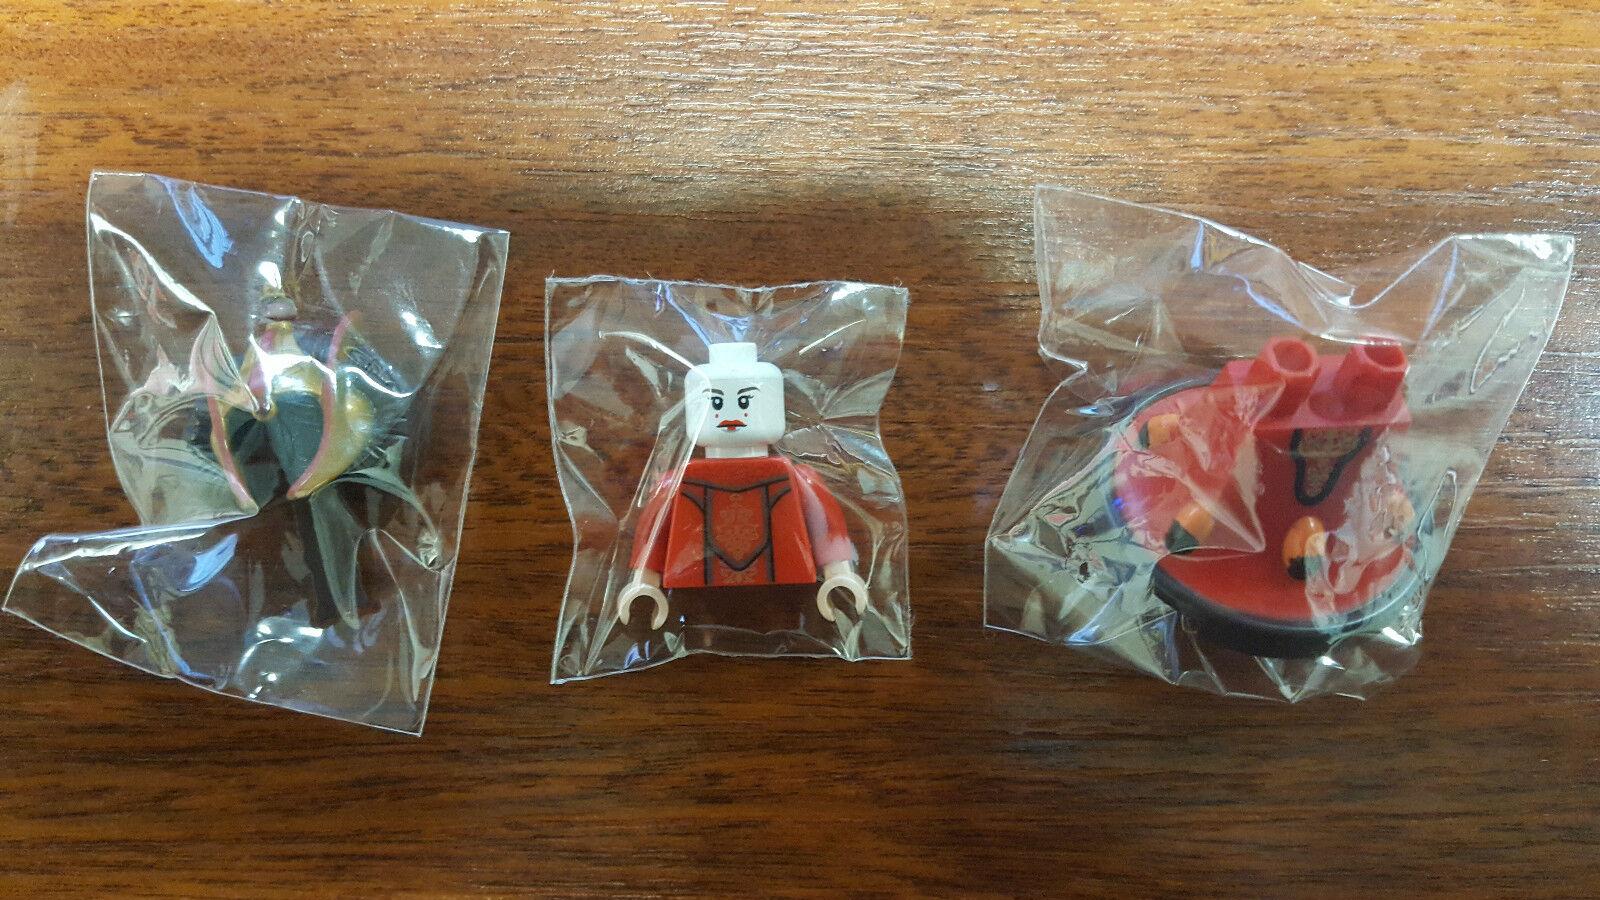 LEGO STAR WARS 9499 sw387 Minifig  AMILDALA  Minifigure - NEW SCELLED - RARE